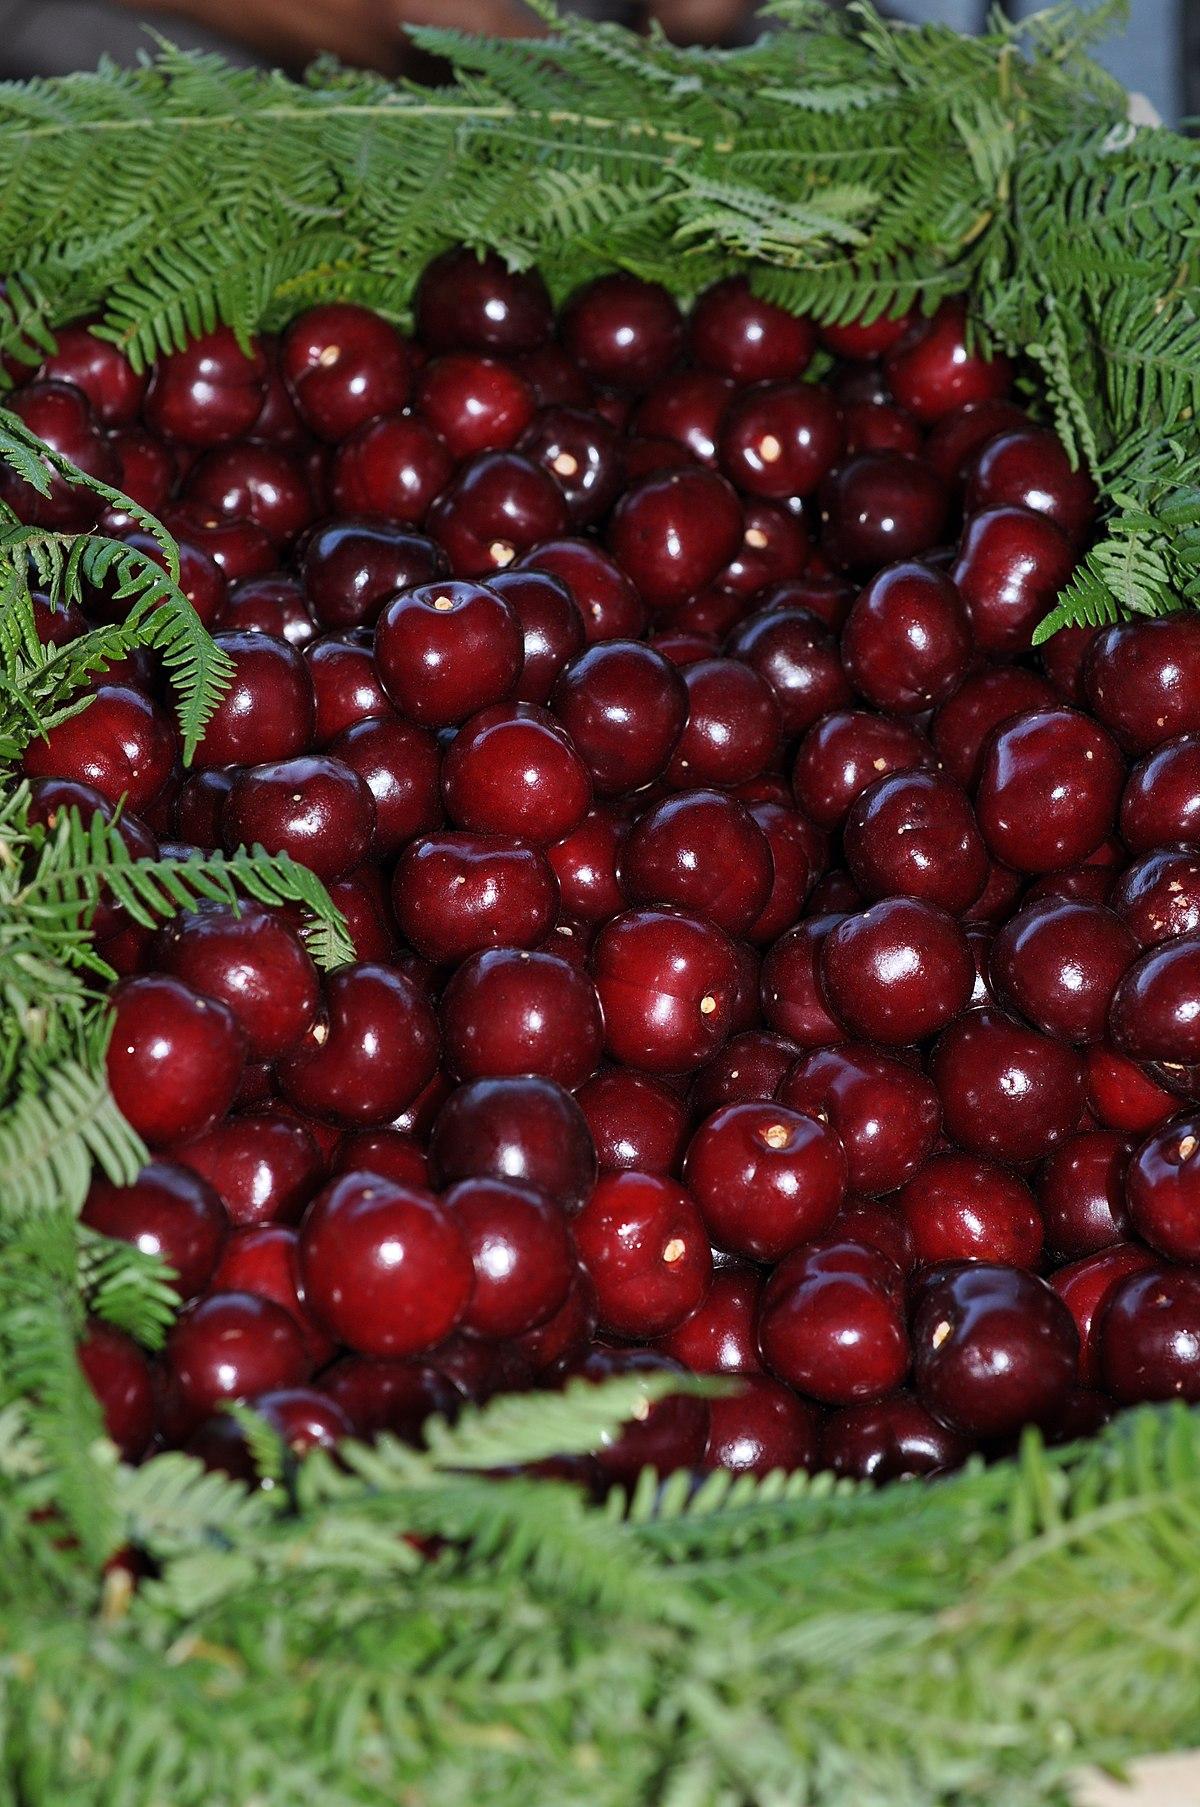 Cherries cerezas Valle del Jerte 01.JPG